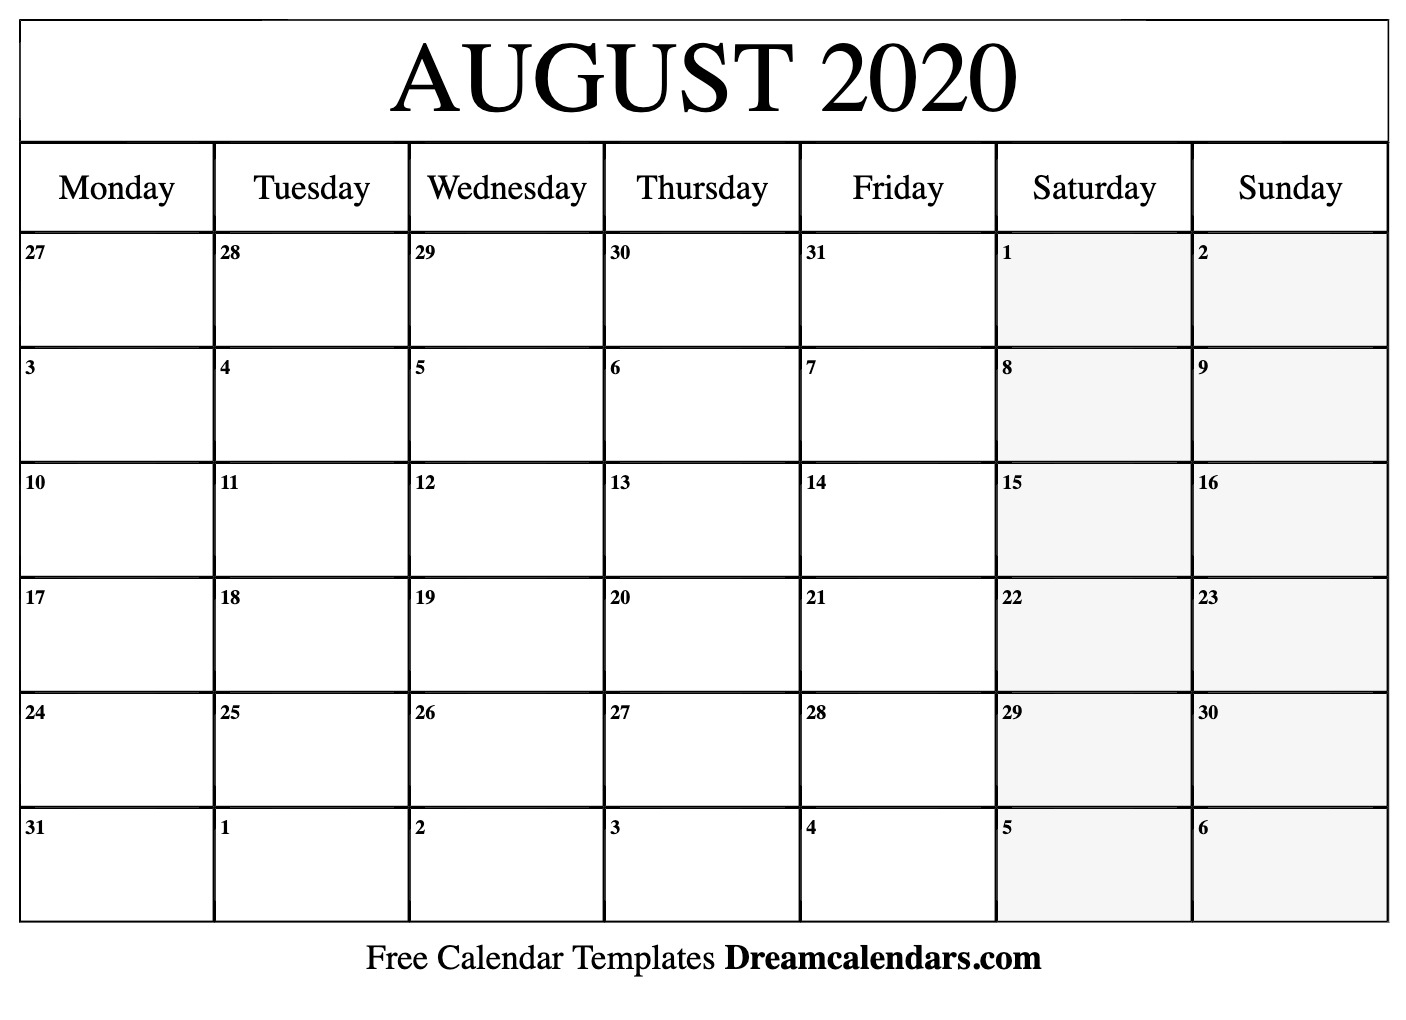 Ko-Fi - Printable August 2020 Calendar - Ko-Fi ❤️ Where